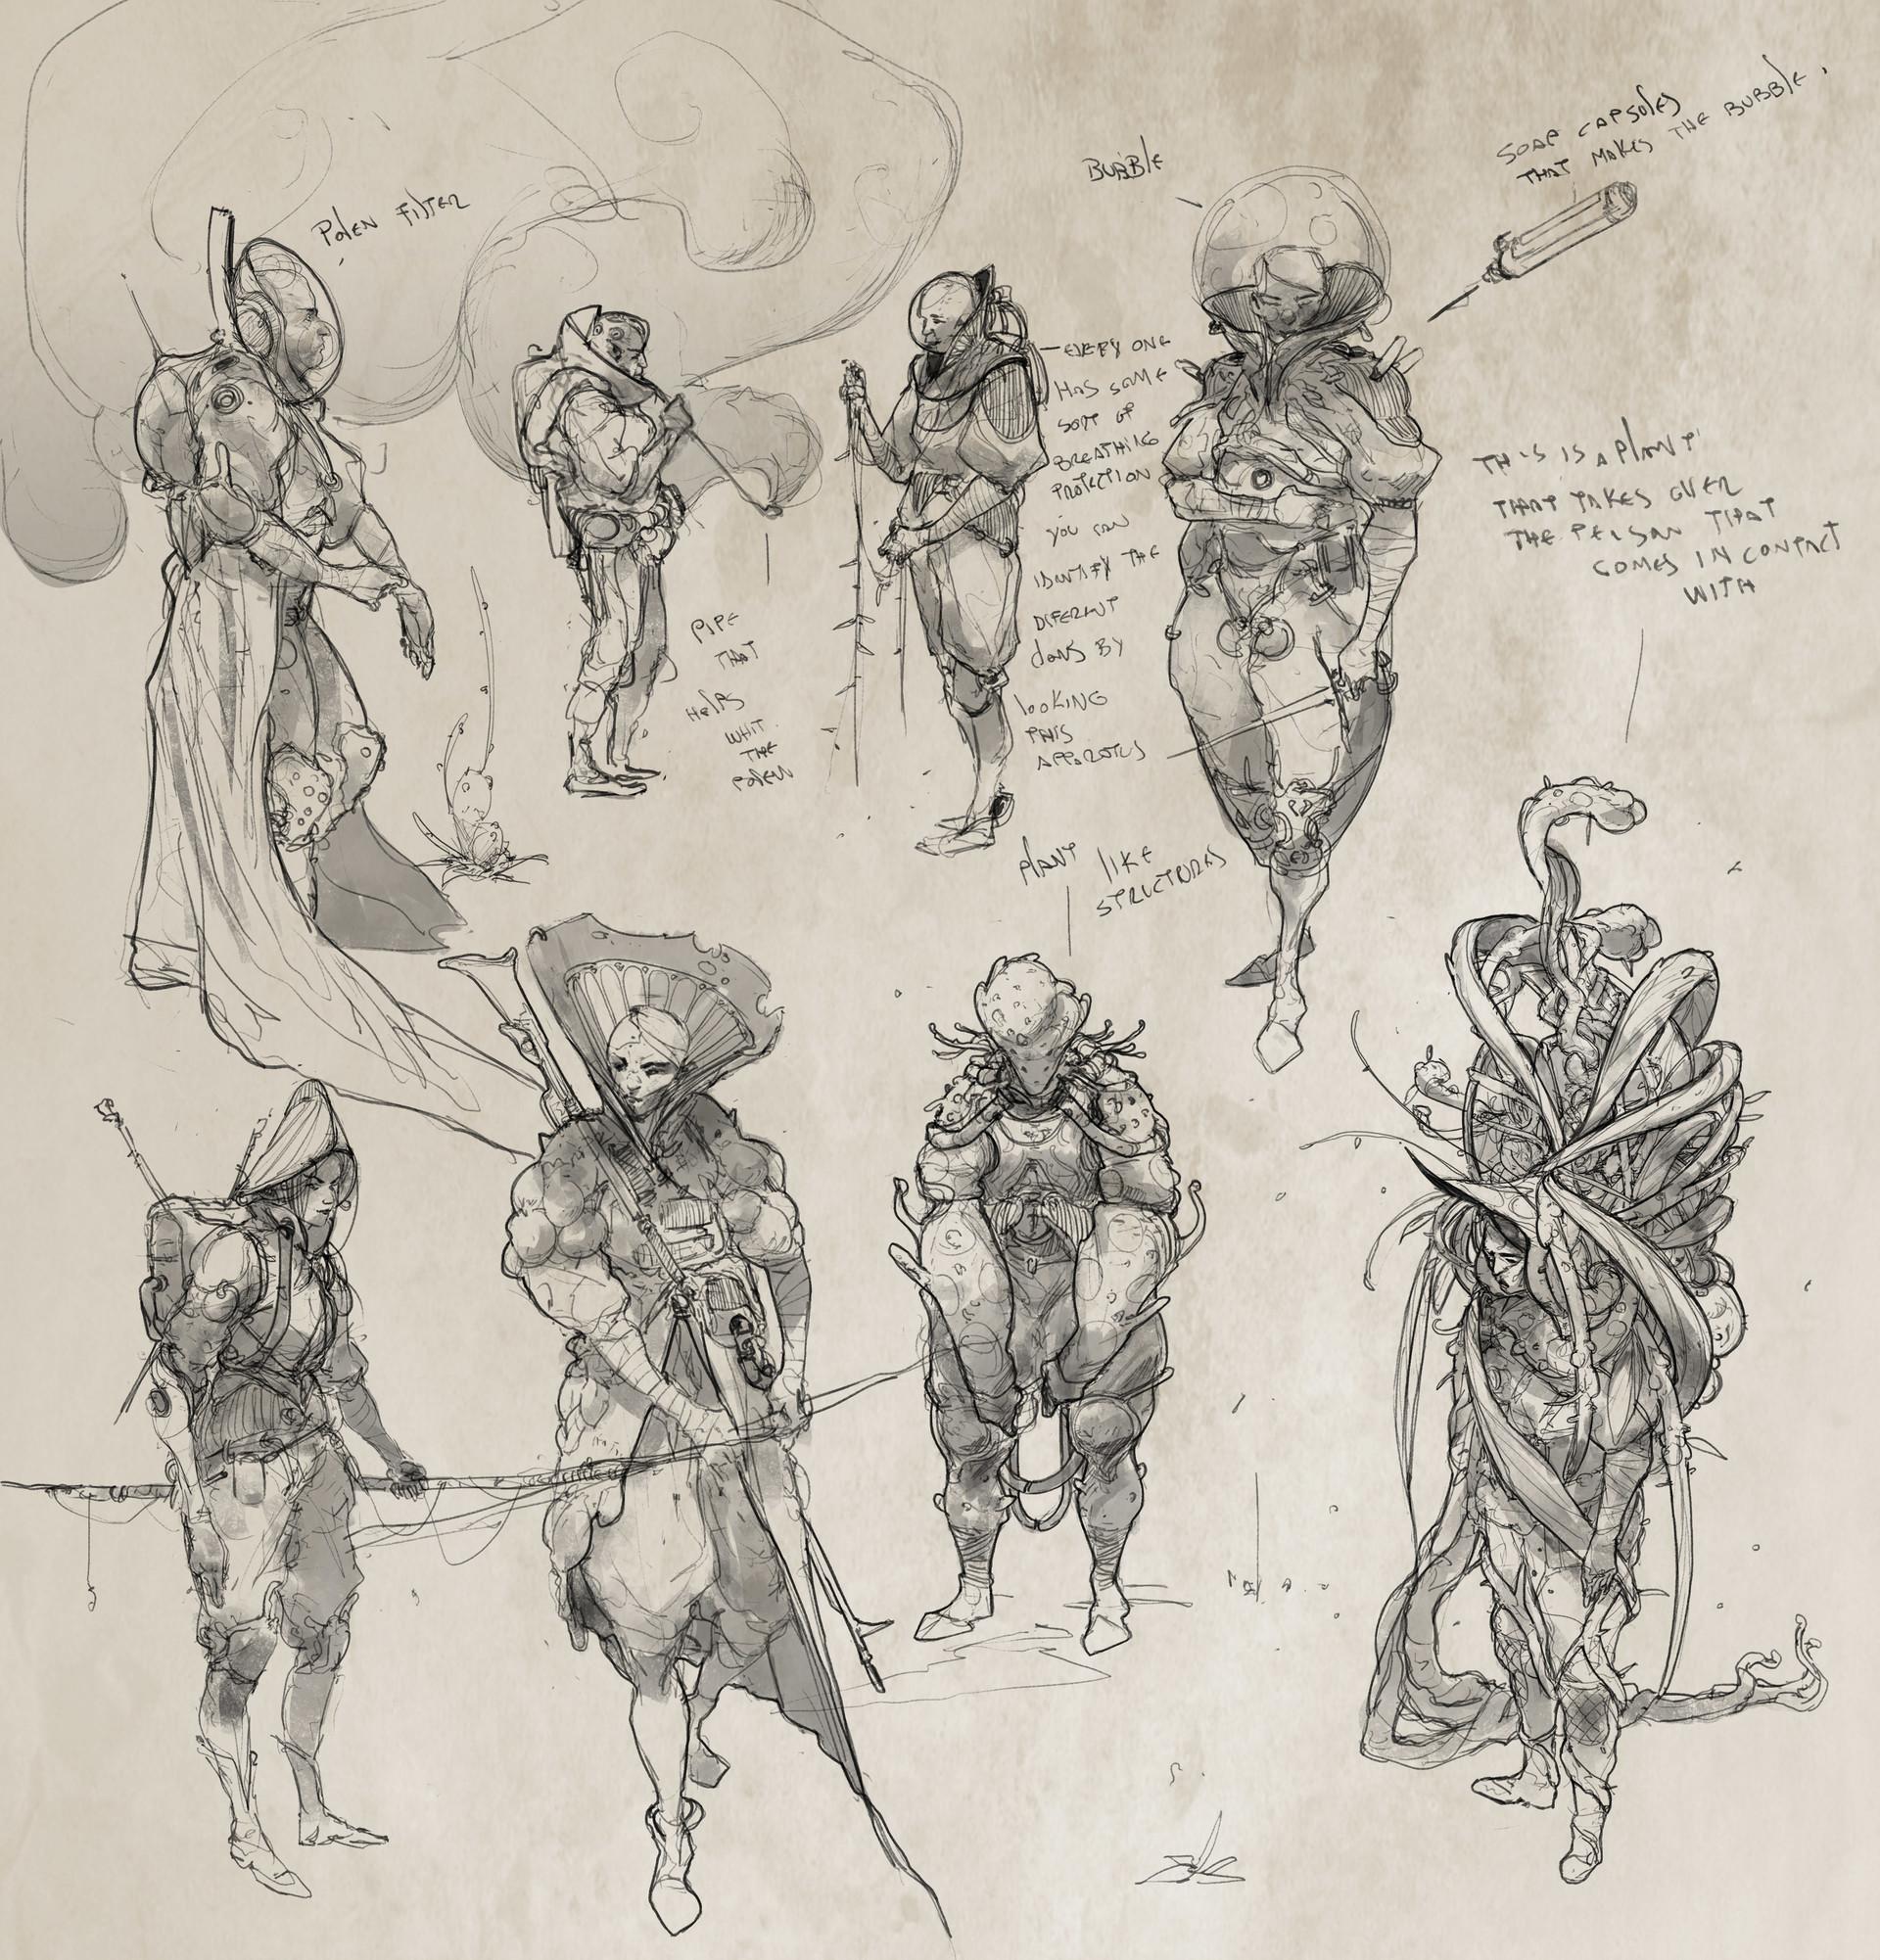 Tano bonfanti character sheet 1